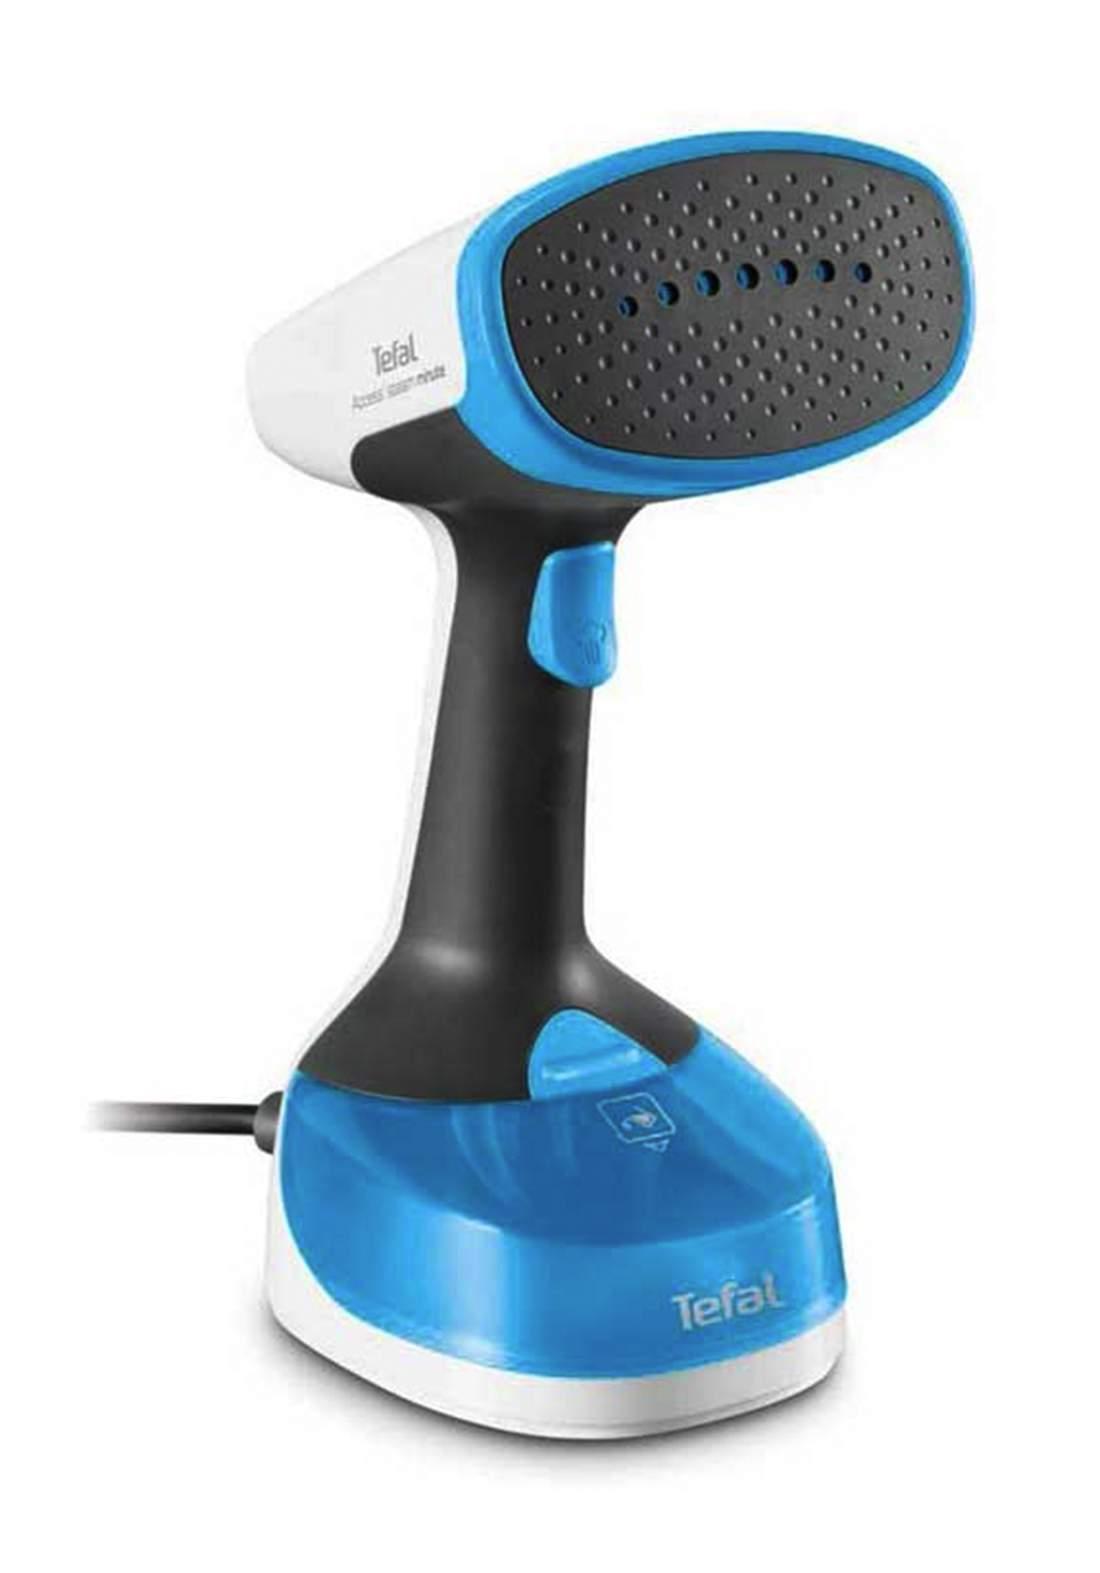 Tefal DT7000M0 Dry Iron -1100 Watt - Blue مكواة بخارية